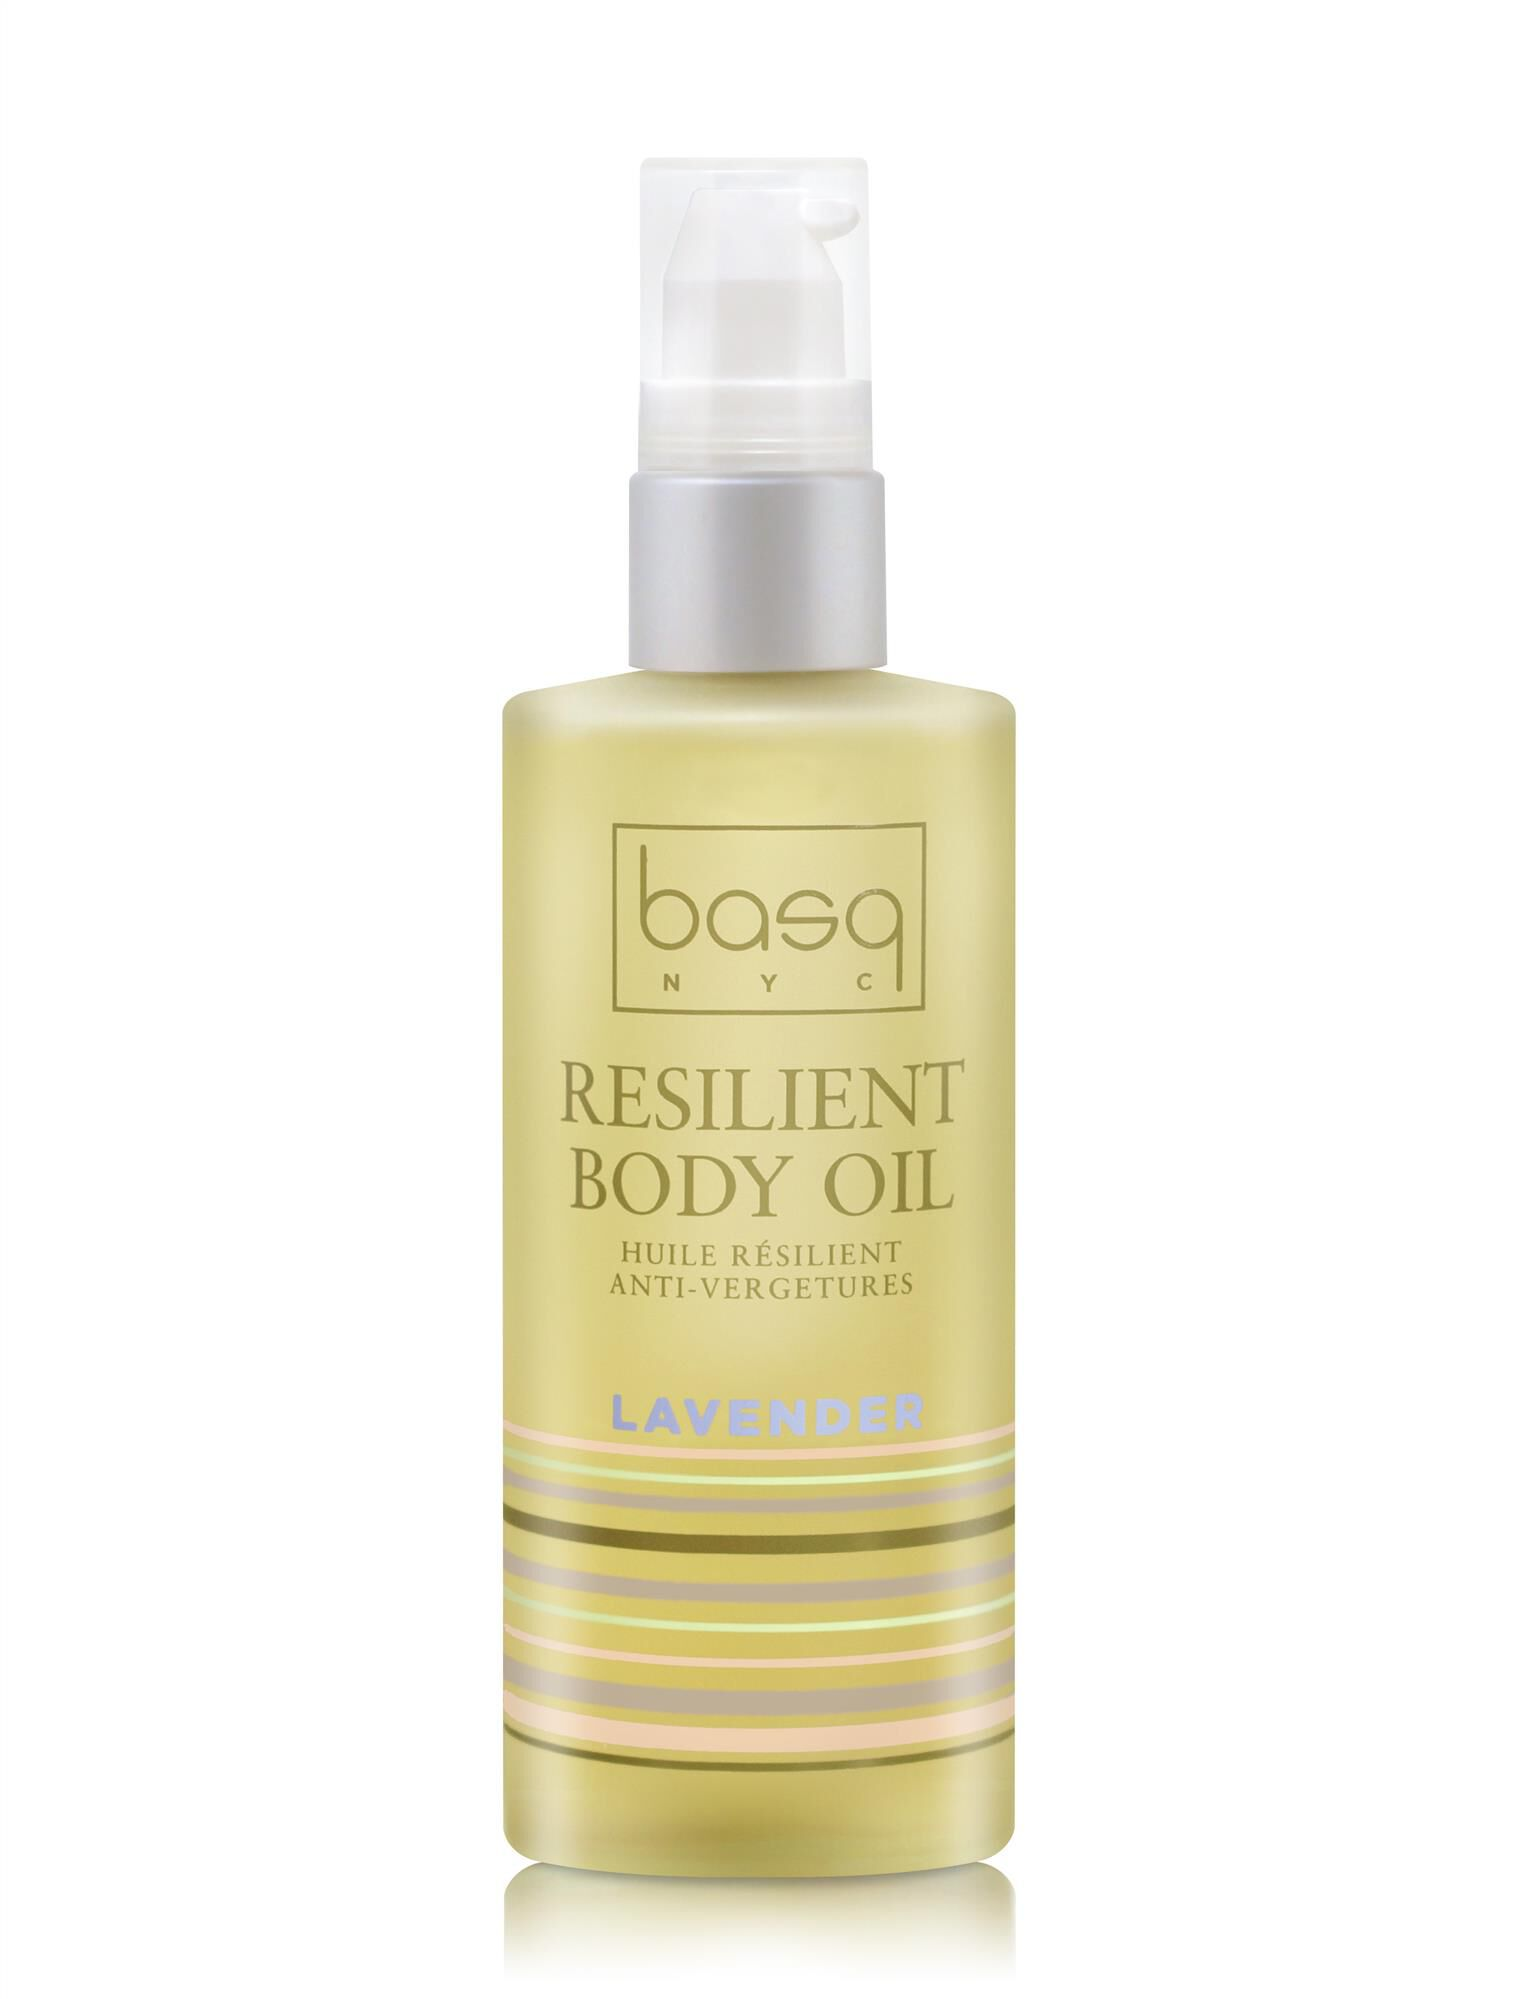 Basq Resilient Body Stretch Mark Oil